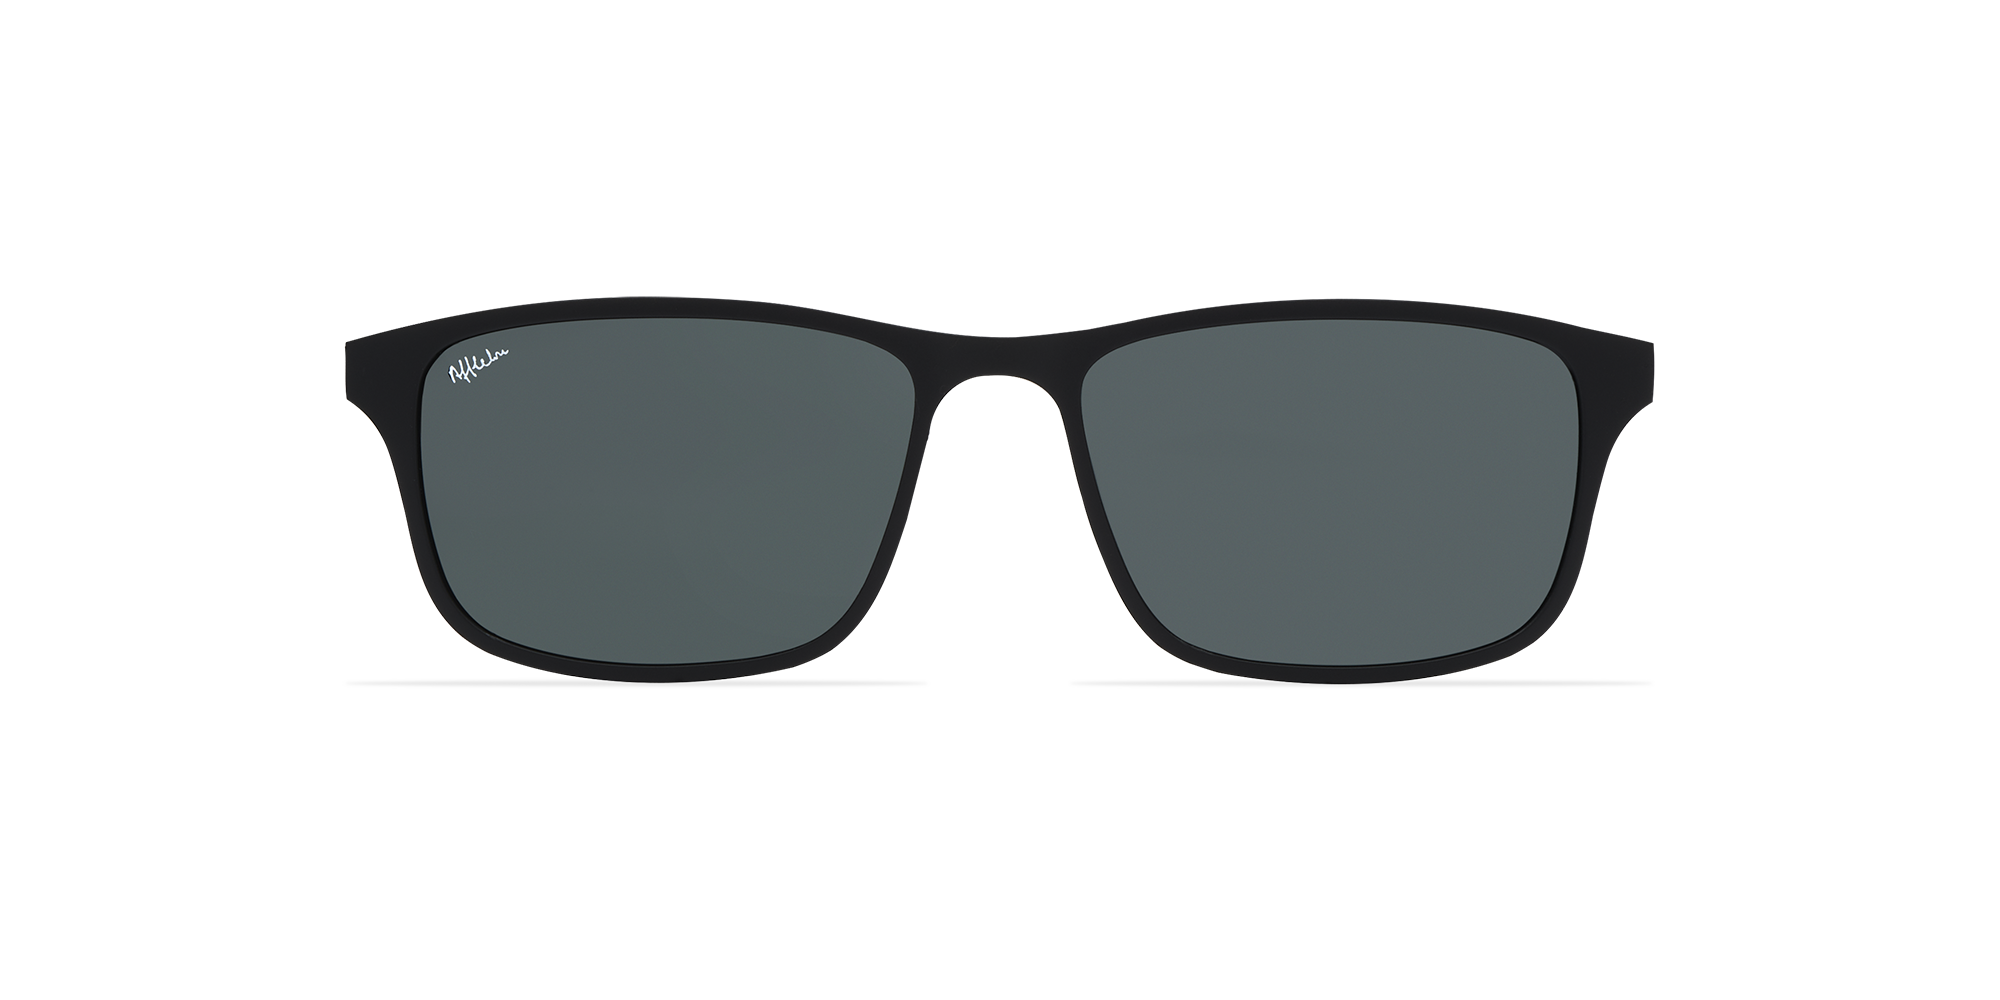 afflelou/france/products/smart_clip/clips_glasses/TMK41POBK015416.png